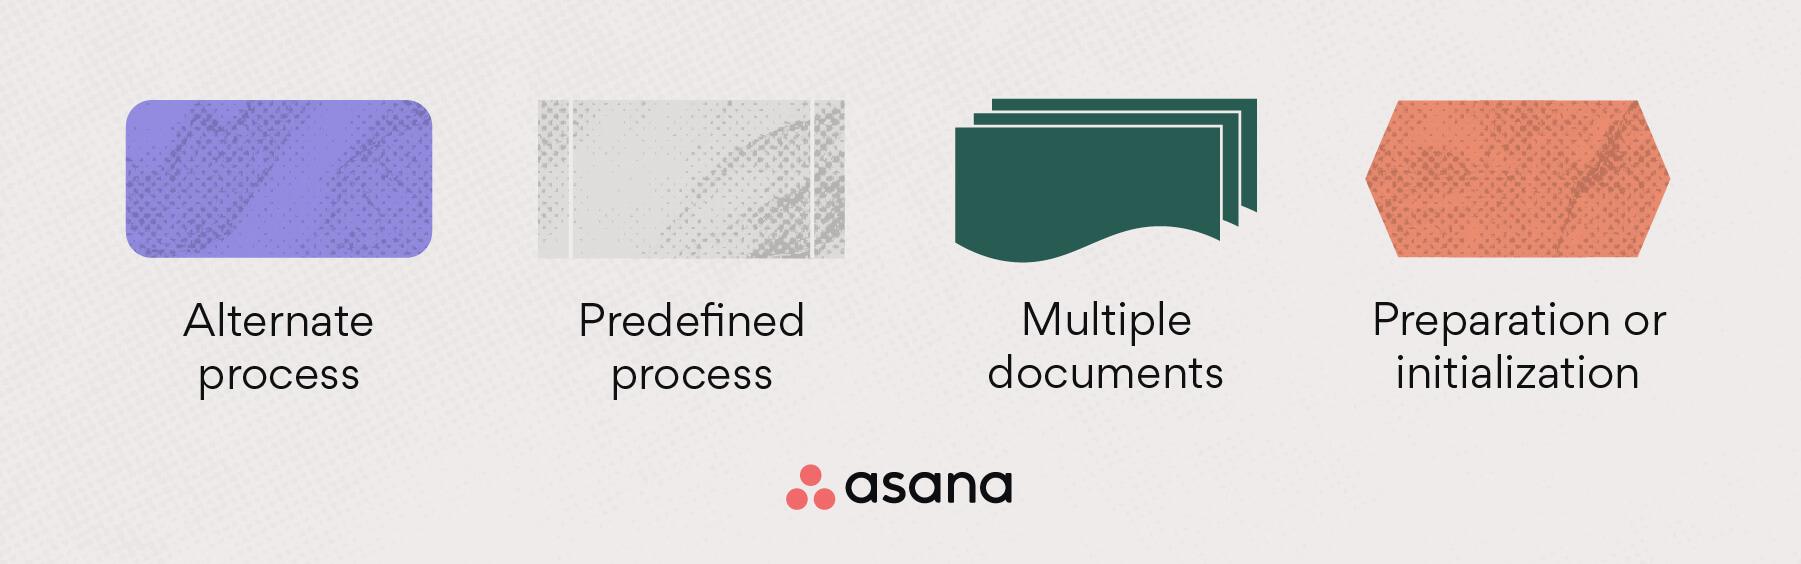 Flowchart symbols: alternate process, predefined process, multiple documents + preparation/initialization